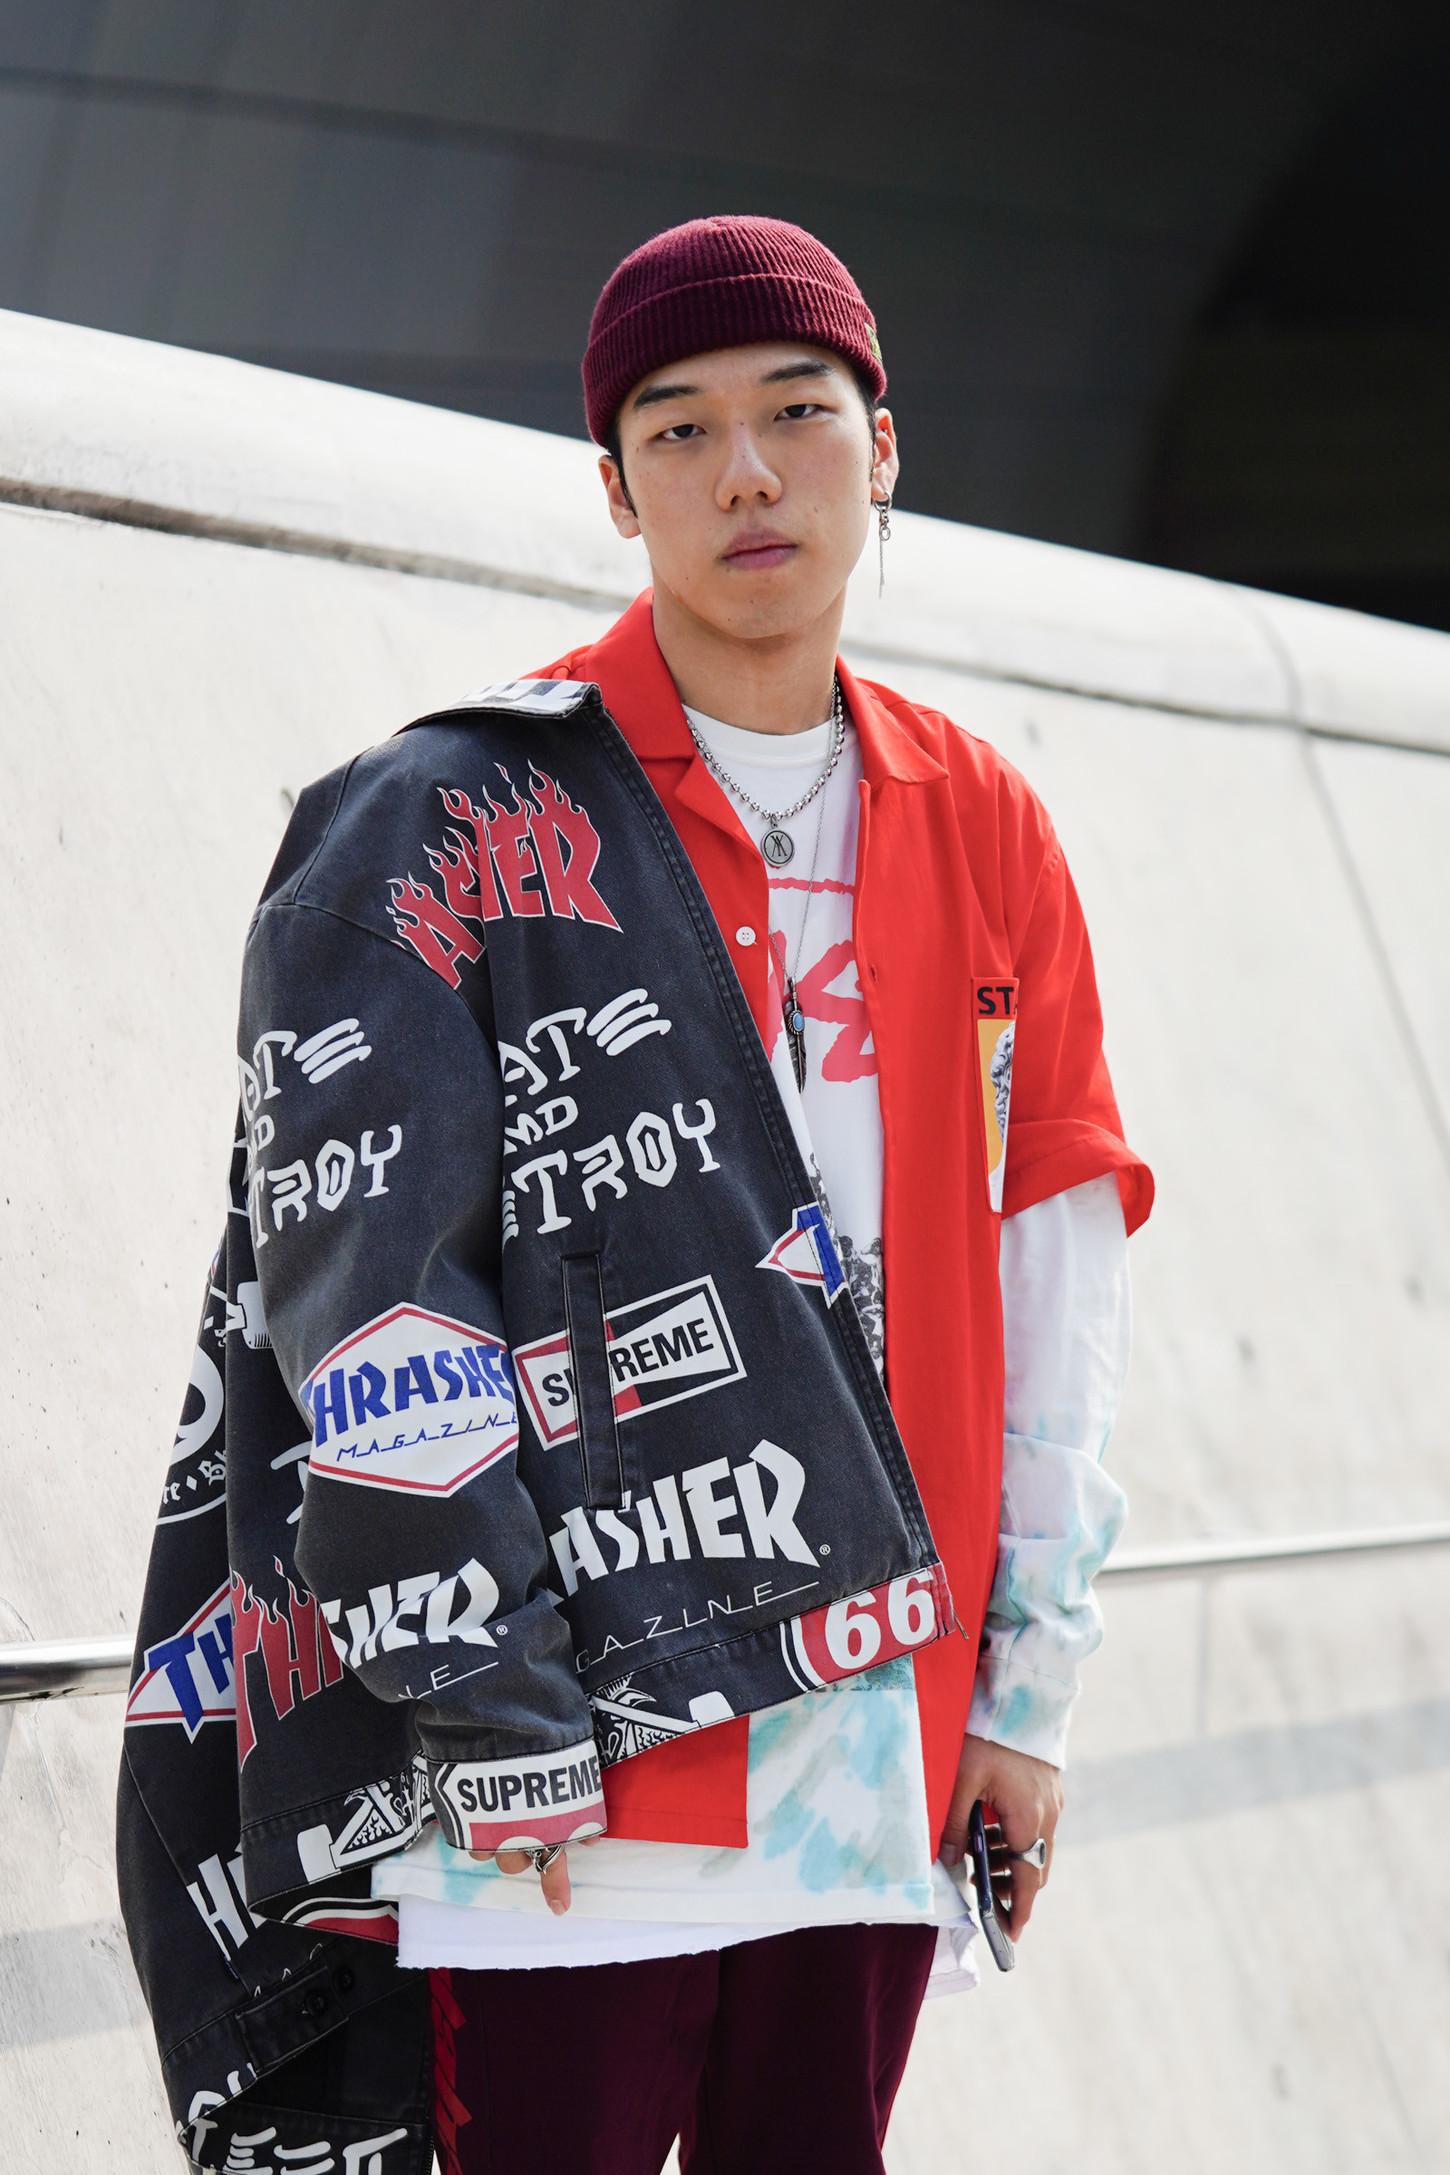 Jang wook Jae